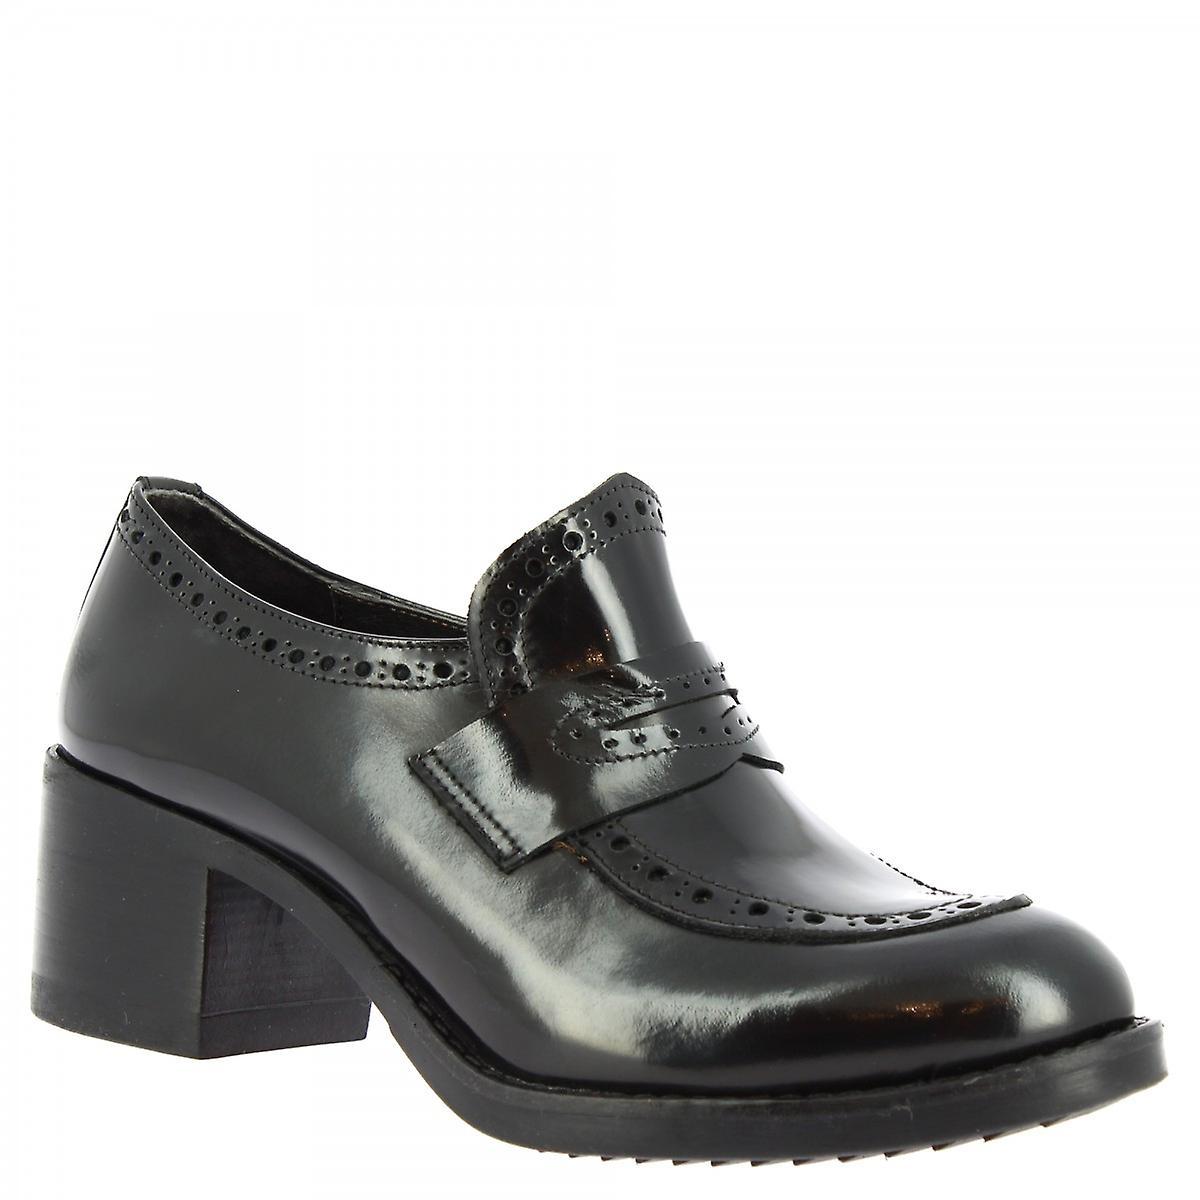 Leonardo Shoes Women's handmade heels loafers shoes in black patent leather Hx0fW